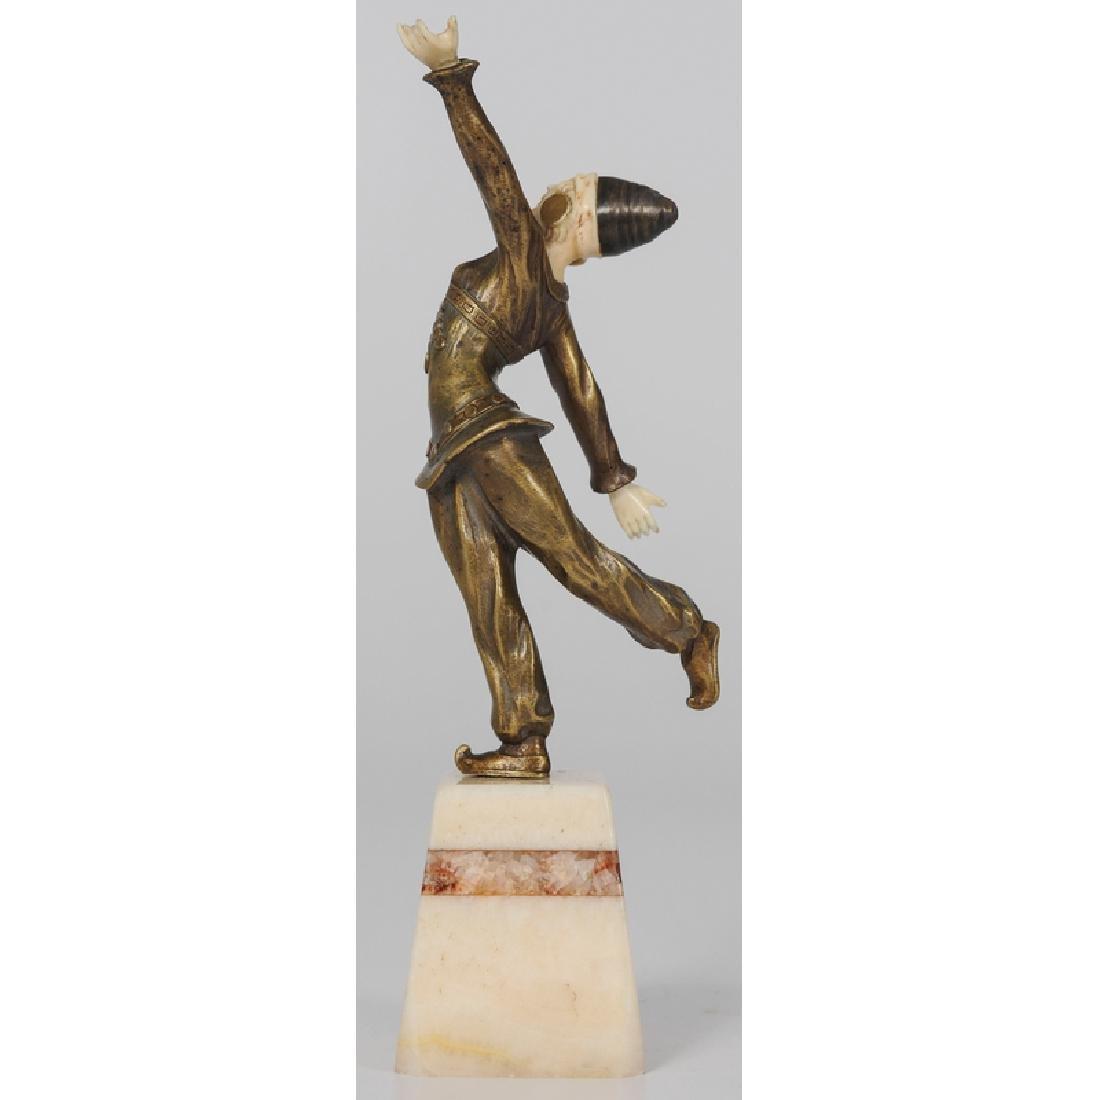 Ivory and Bronze Sculpture Signed Solange Bertrand - 2